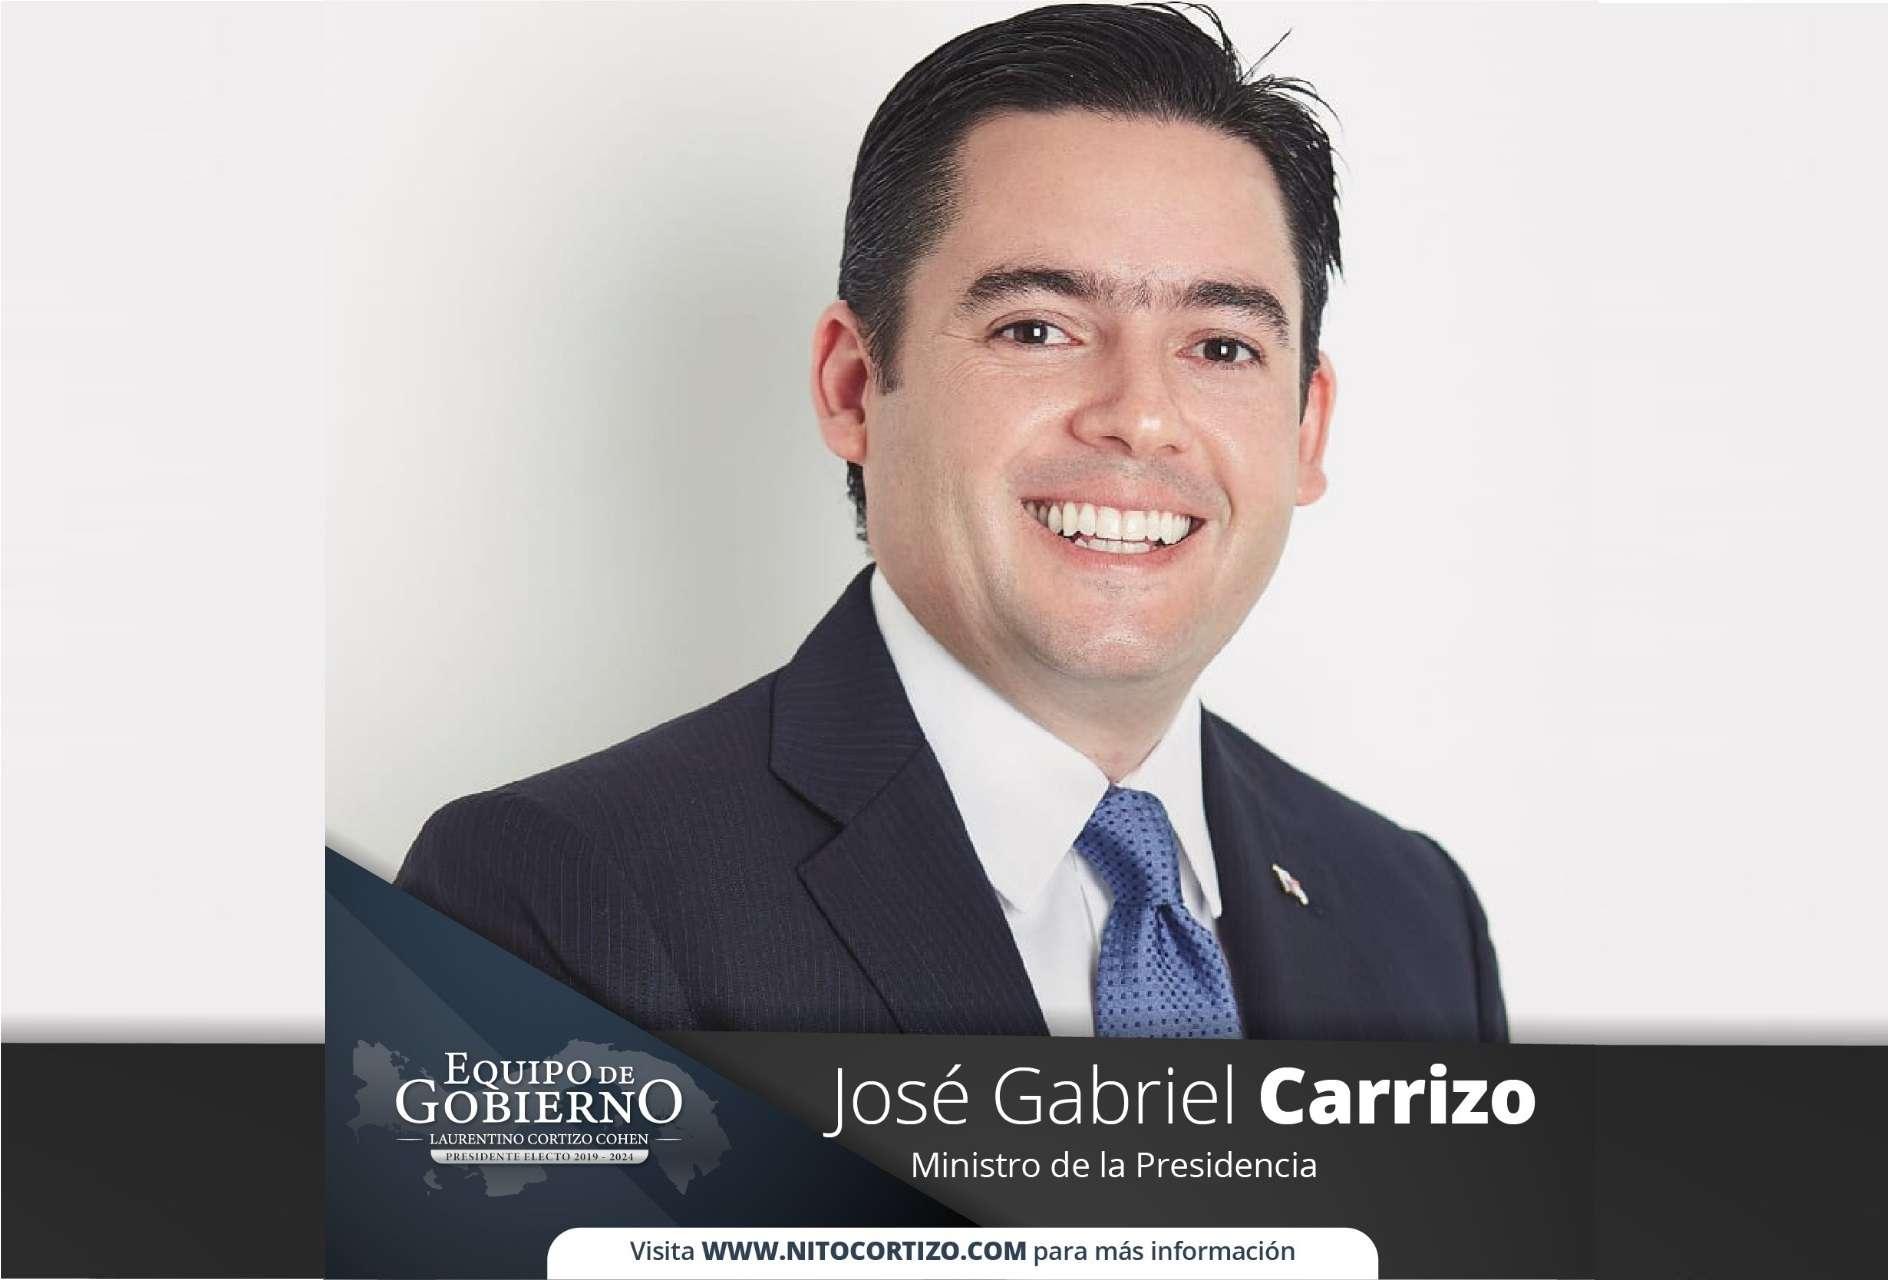 José Gabriel Carrizo, Ministro de la Presidencia.